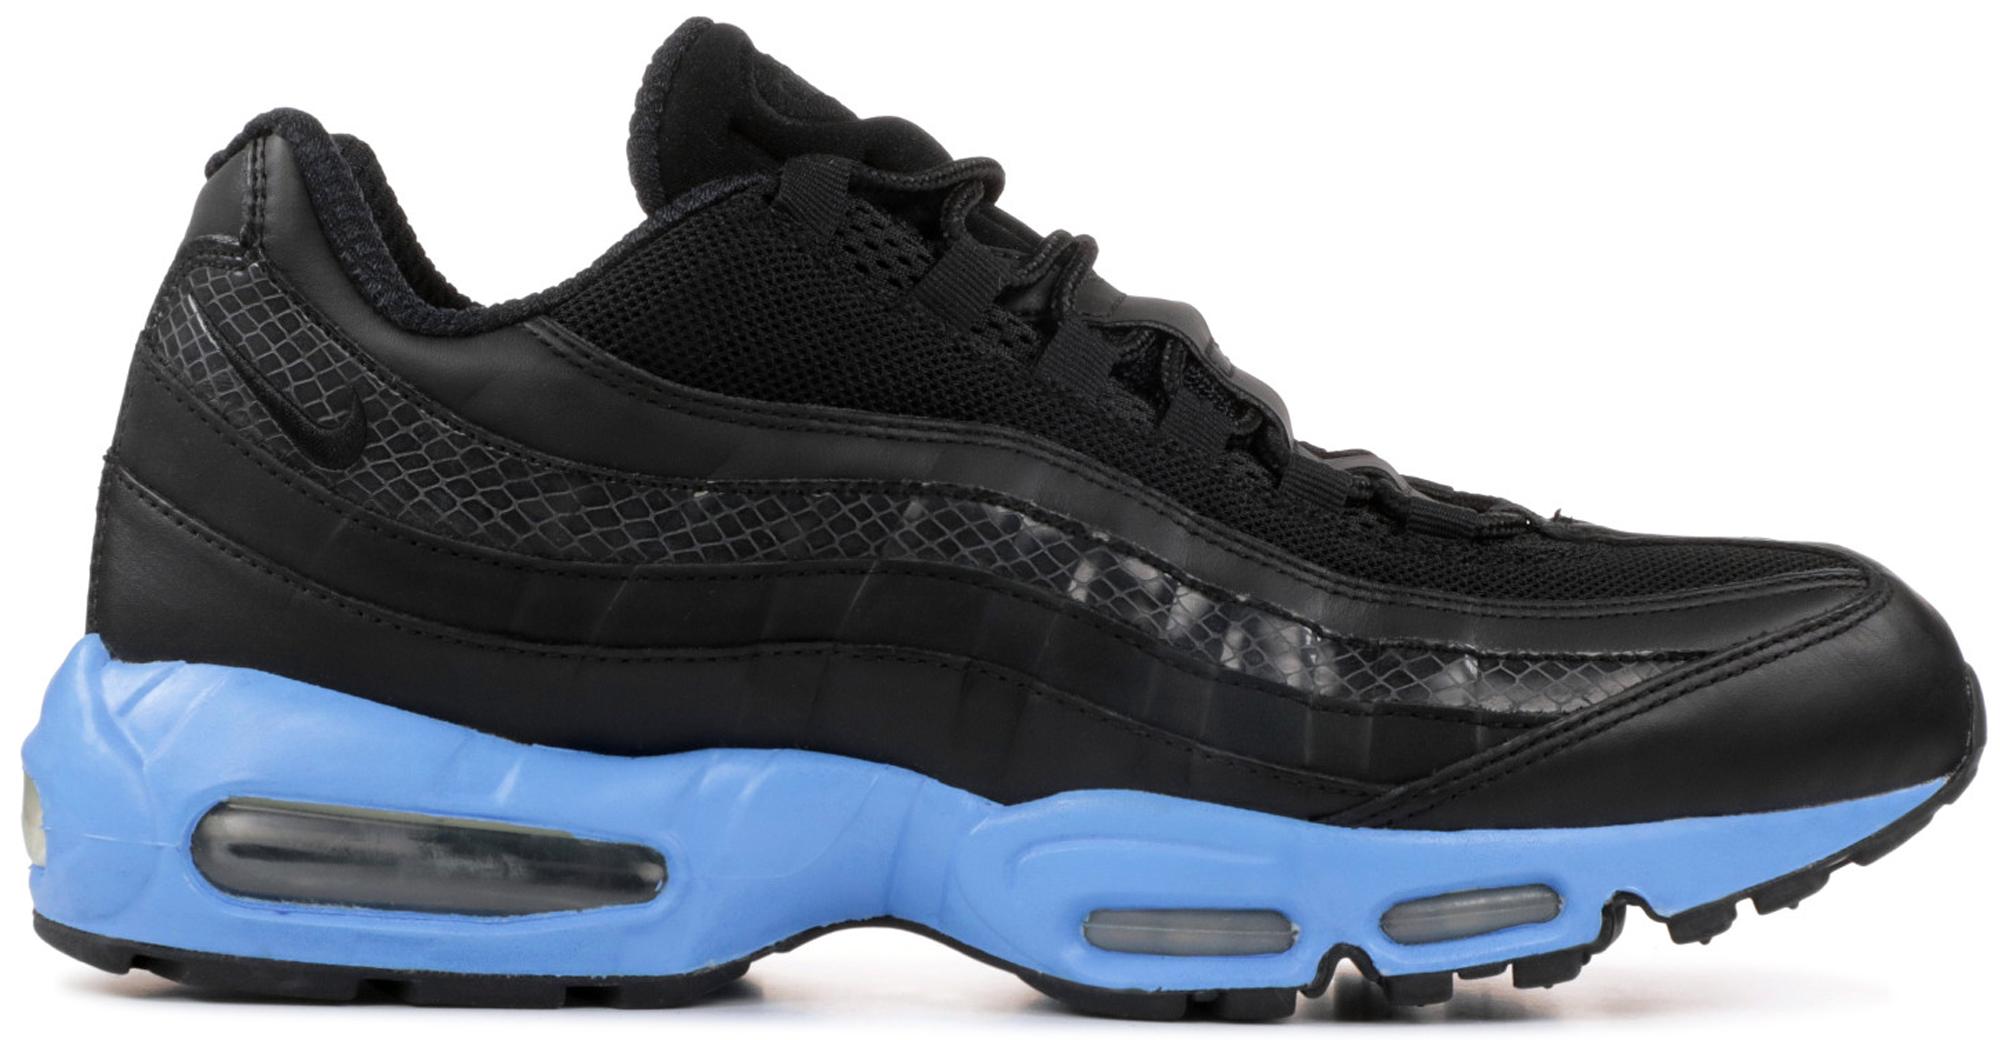 black and blue 95 air max